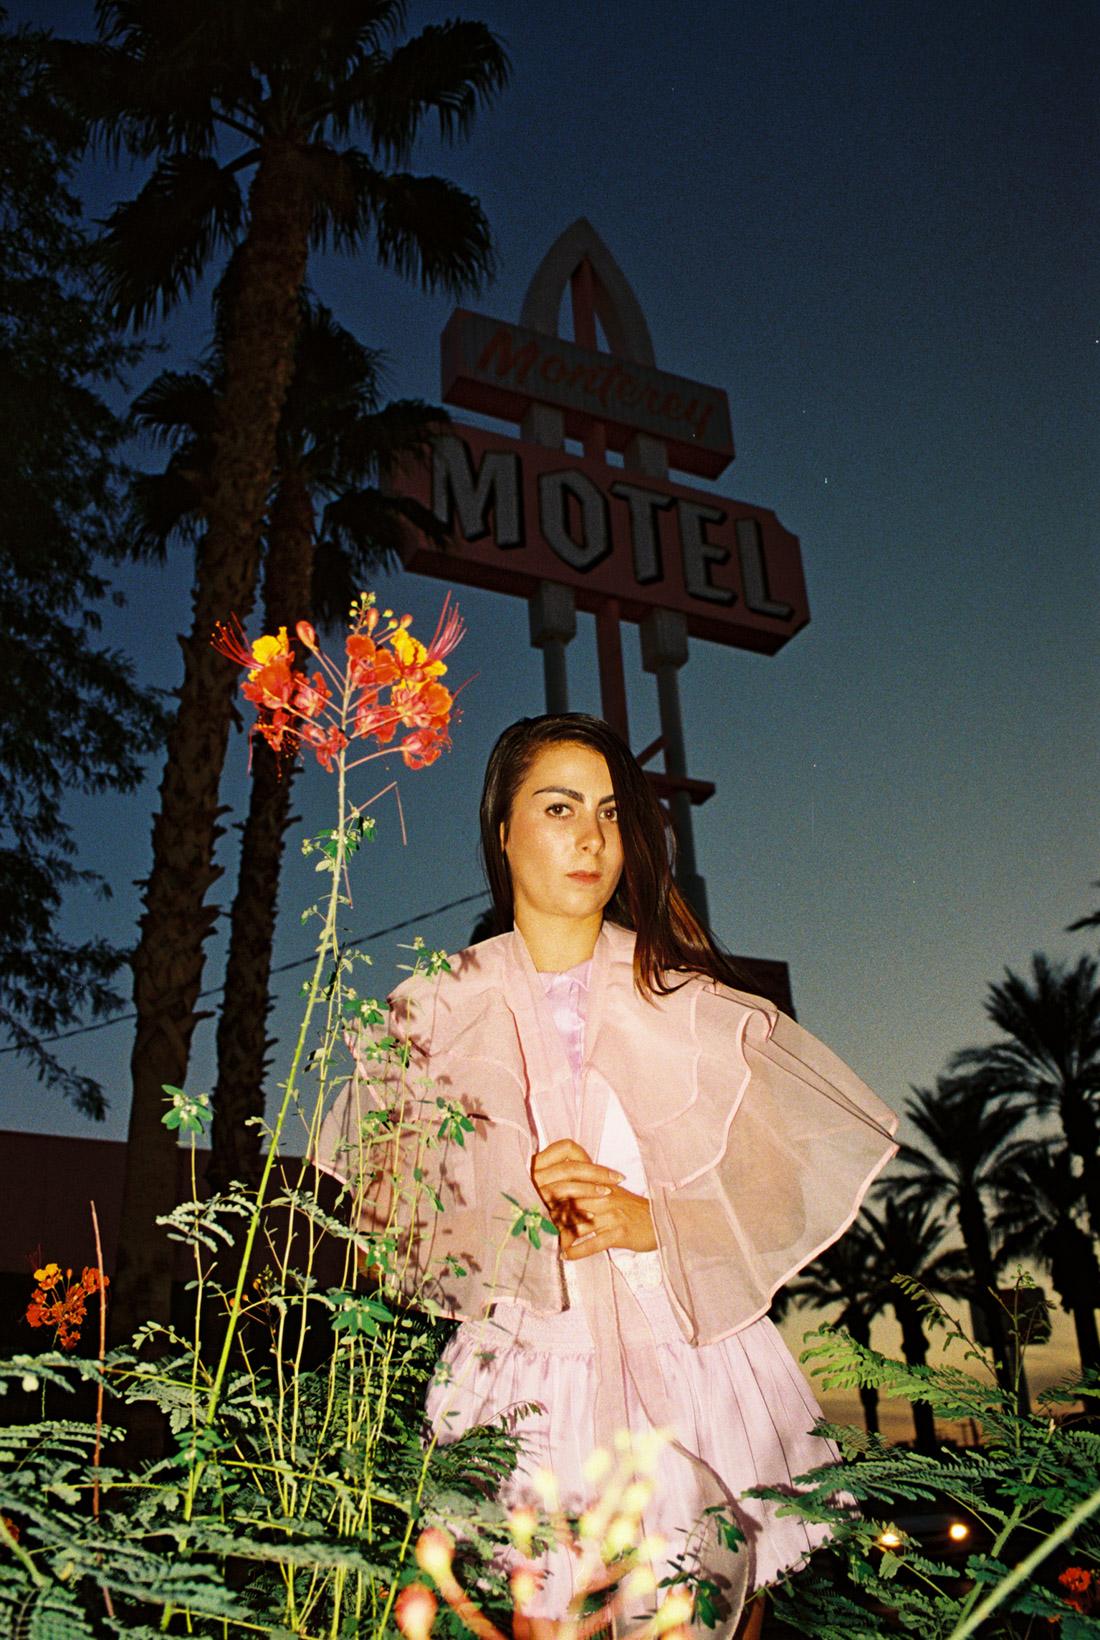 Cara at the Monterery Motel